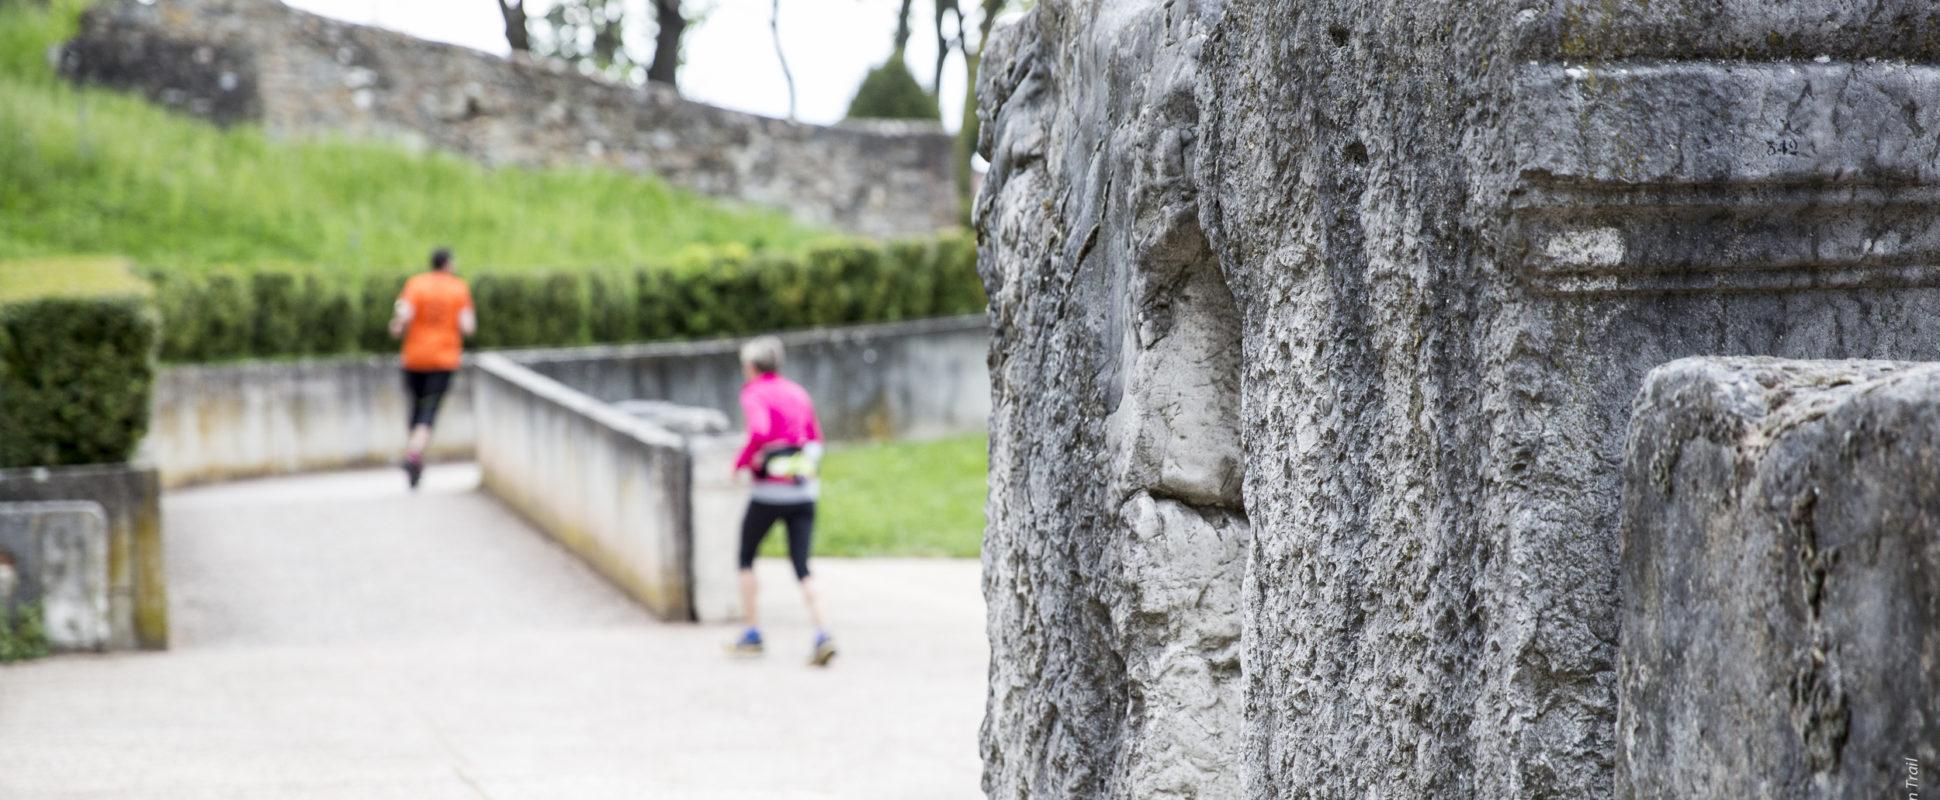 Course à pied Lyon Urban Trail – Trail Urbain – LUT - © Gilles Reboisson